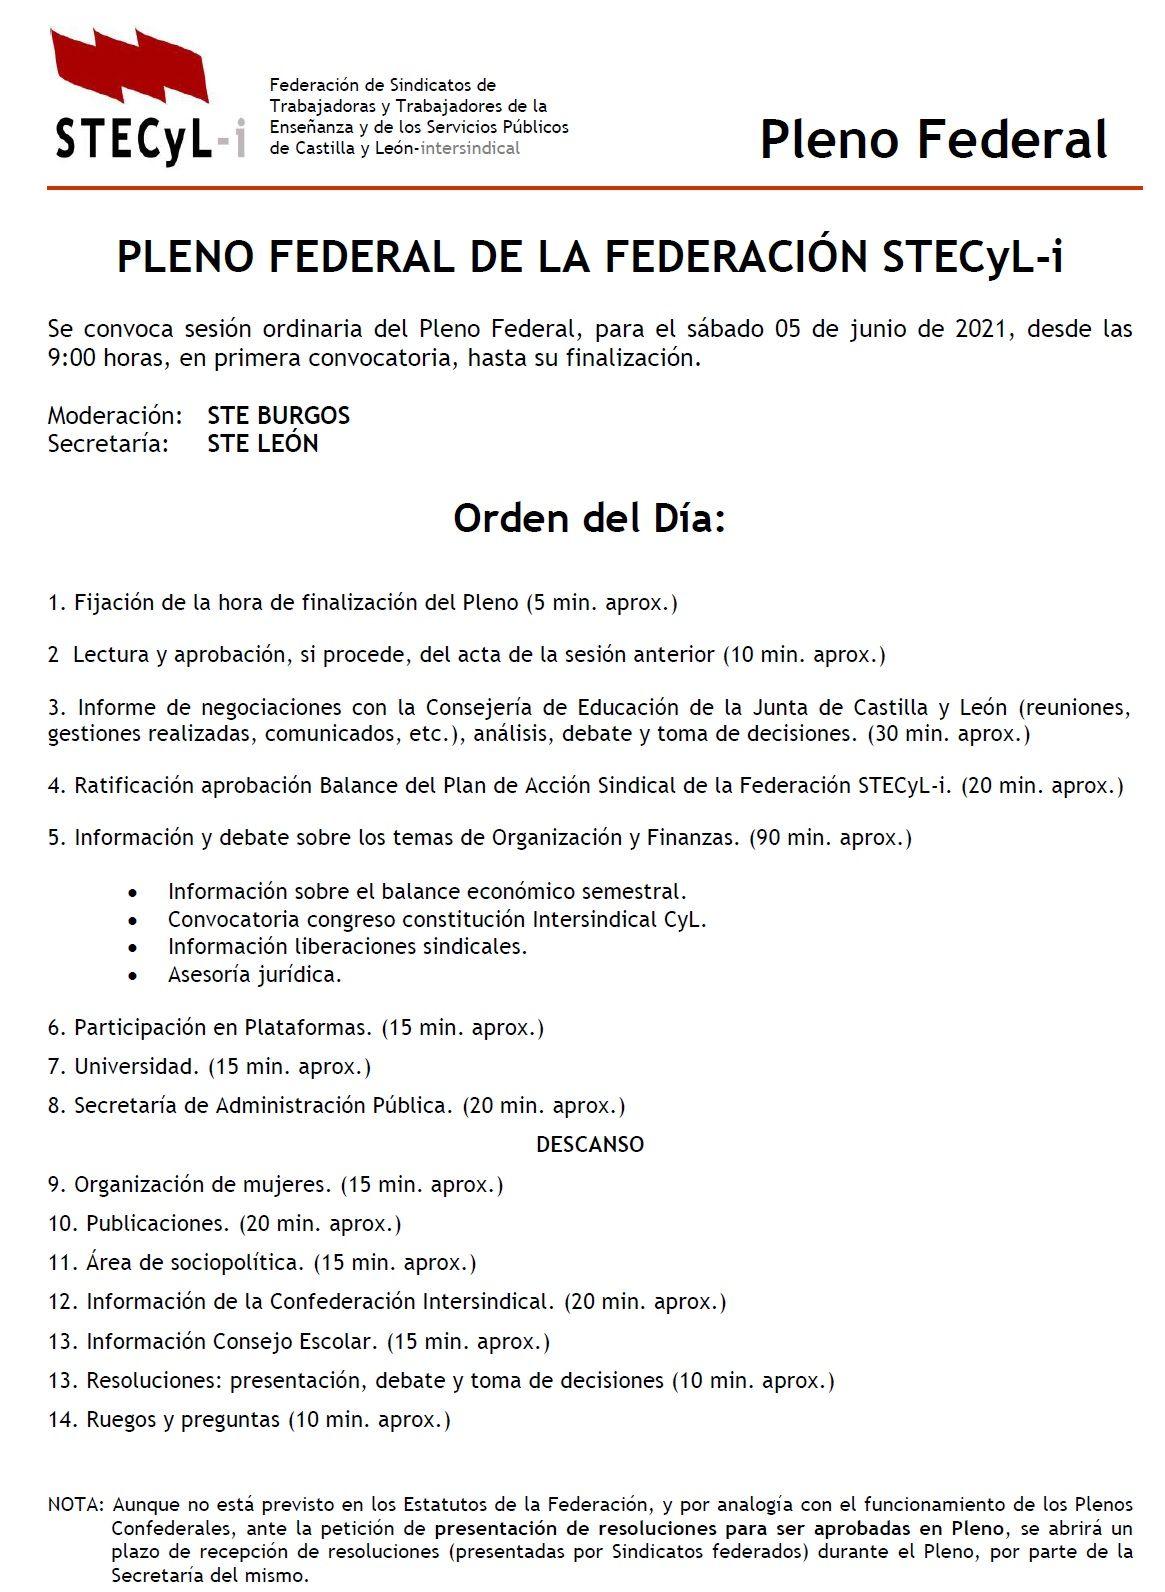 Convocatoria-Pleno-Federal-STECyL-i-Junio-2021